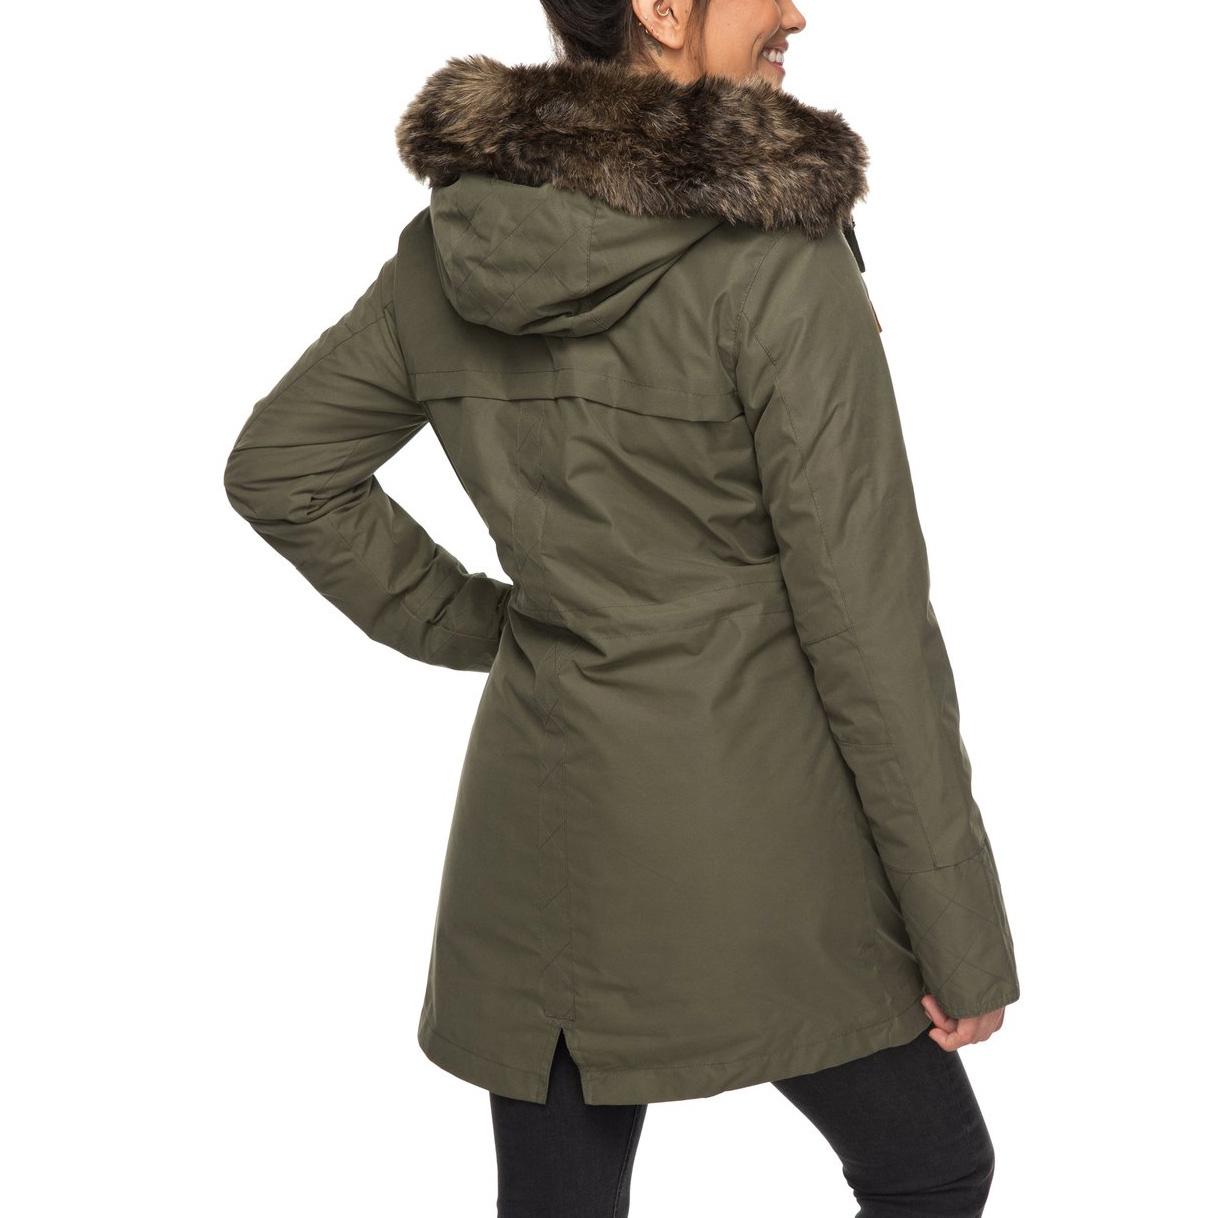 D'hiver Jacket Roxy 3n1 Manteau Amy CnwdqxdB4A